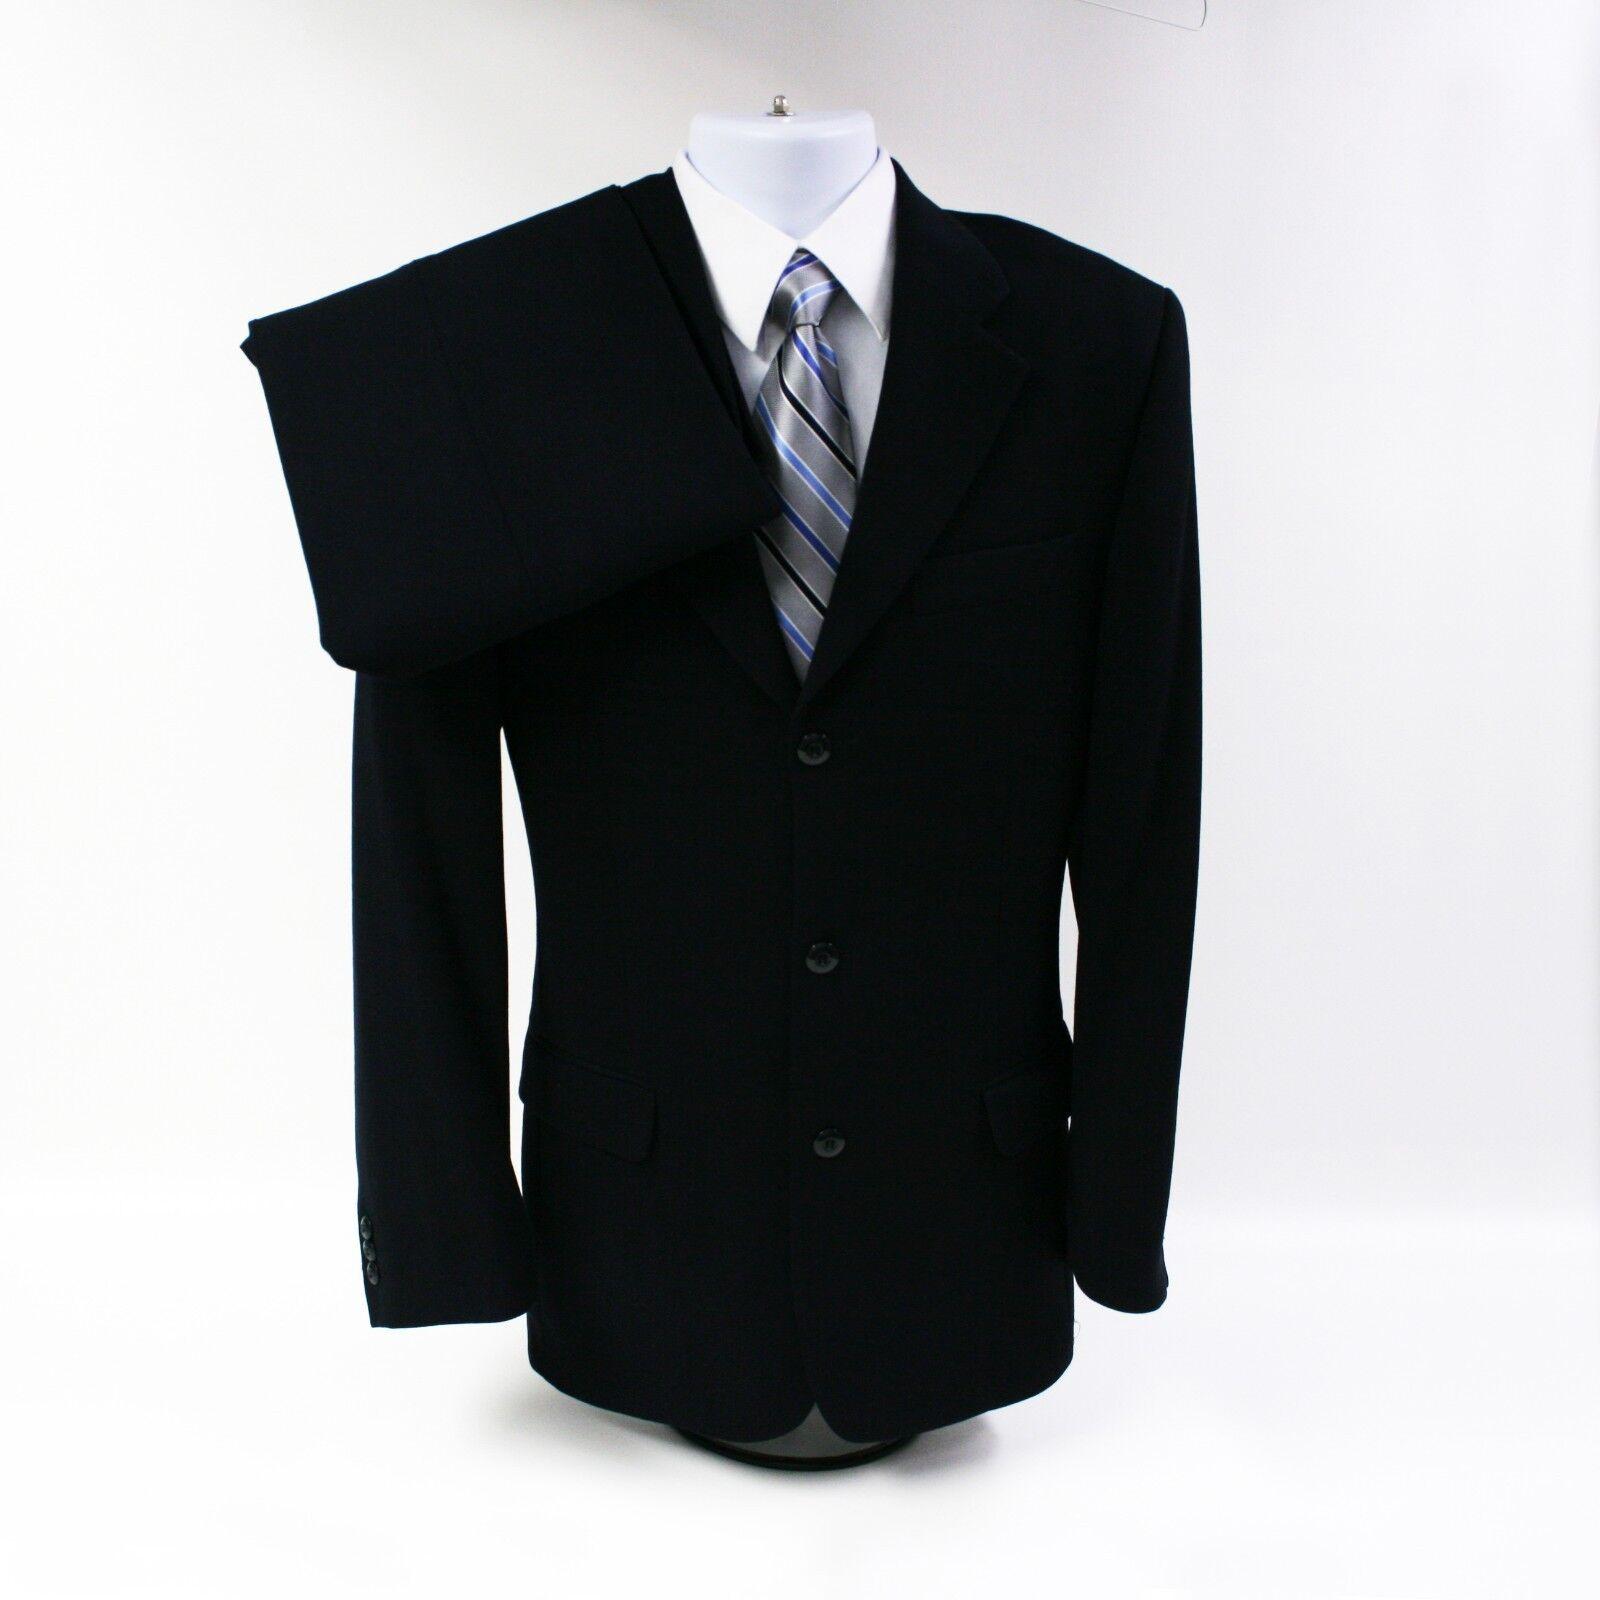 Herren 38 Bachrach Italian Navy Blau 100% Wool 2 Piece Suit 29 Waist, 32 Length